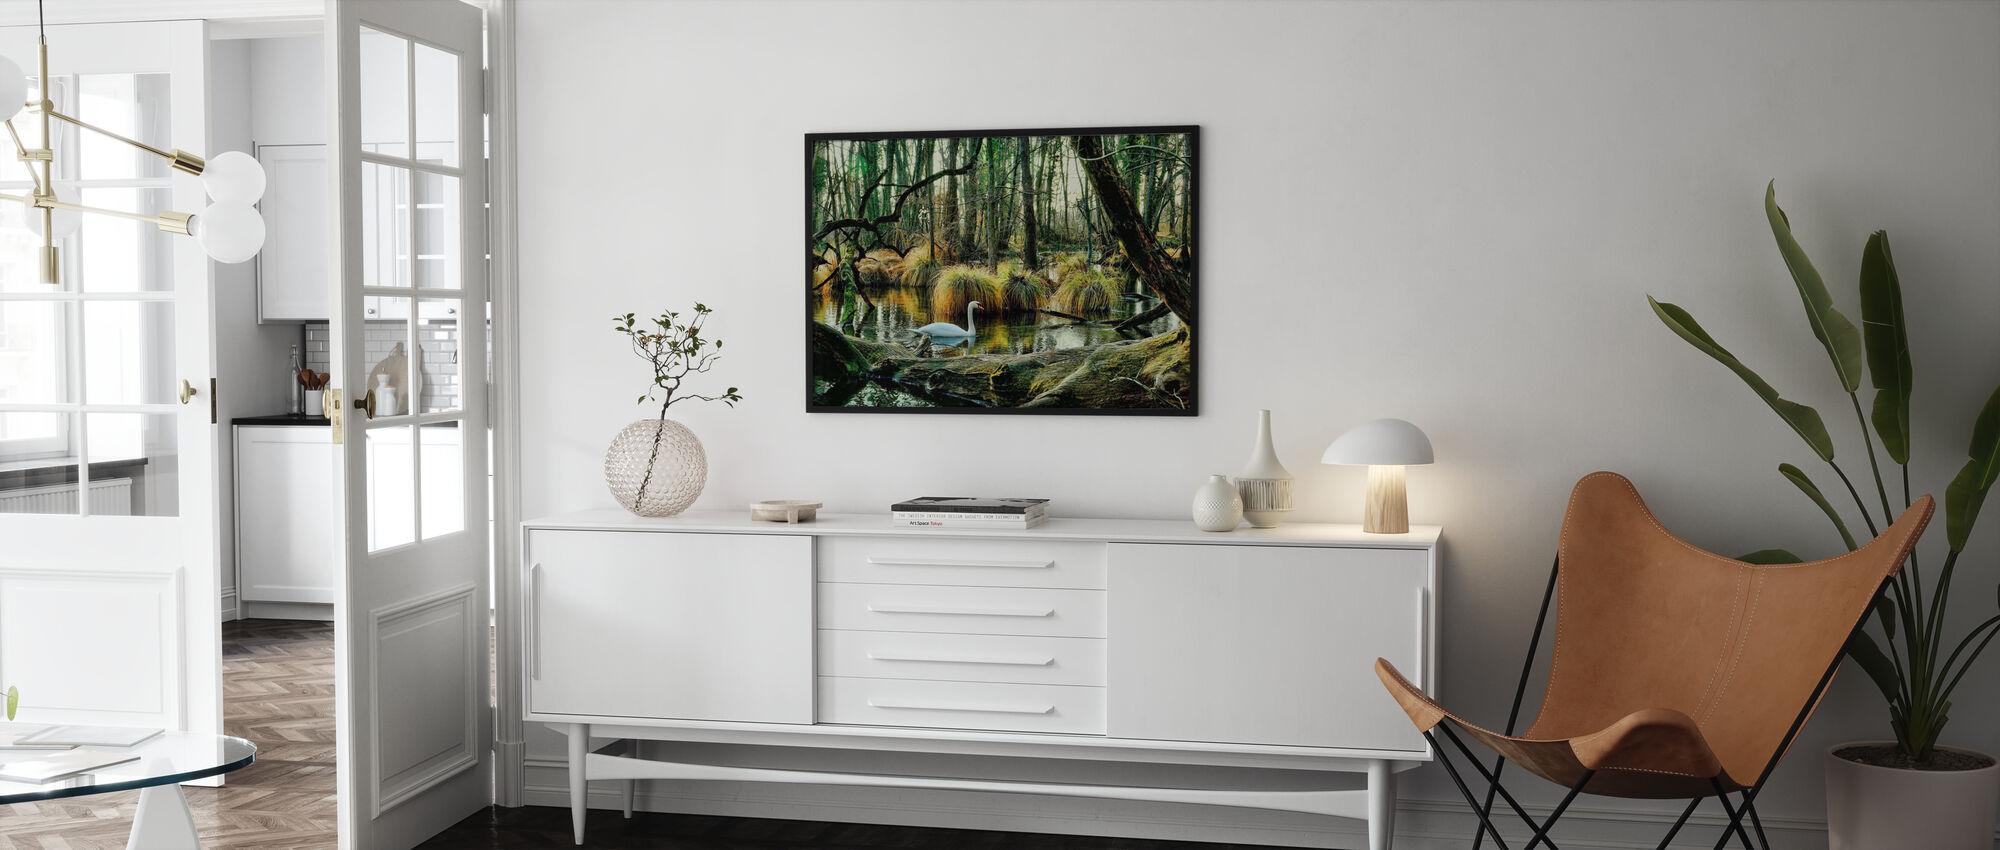 Swan in Swamp - Poster - Living Room